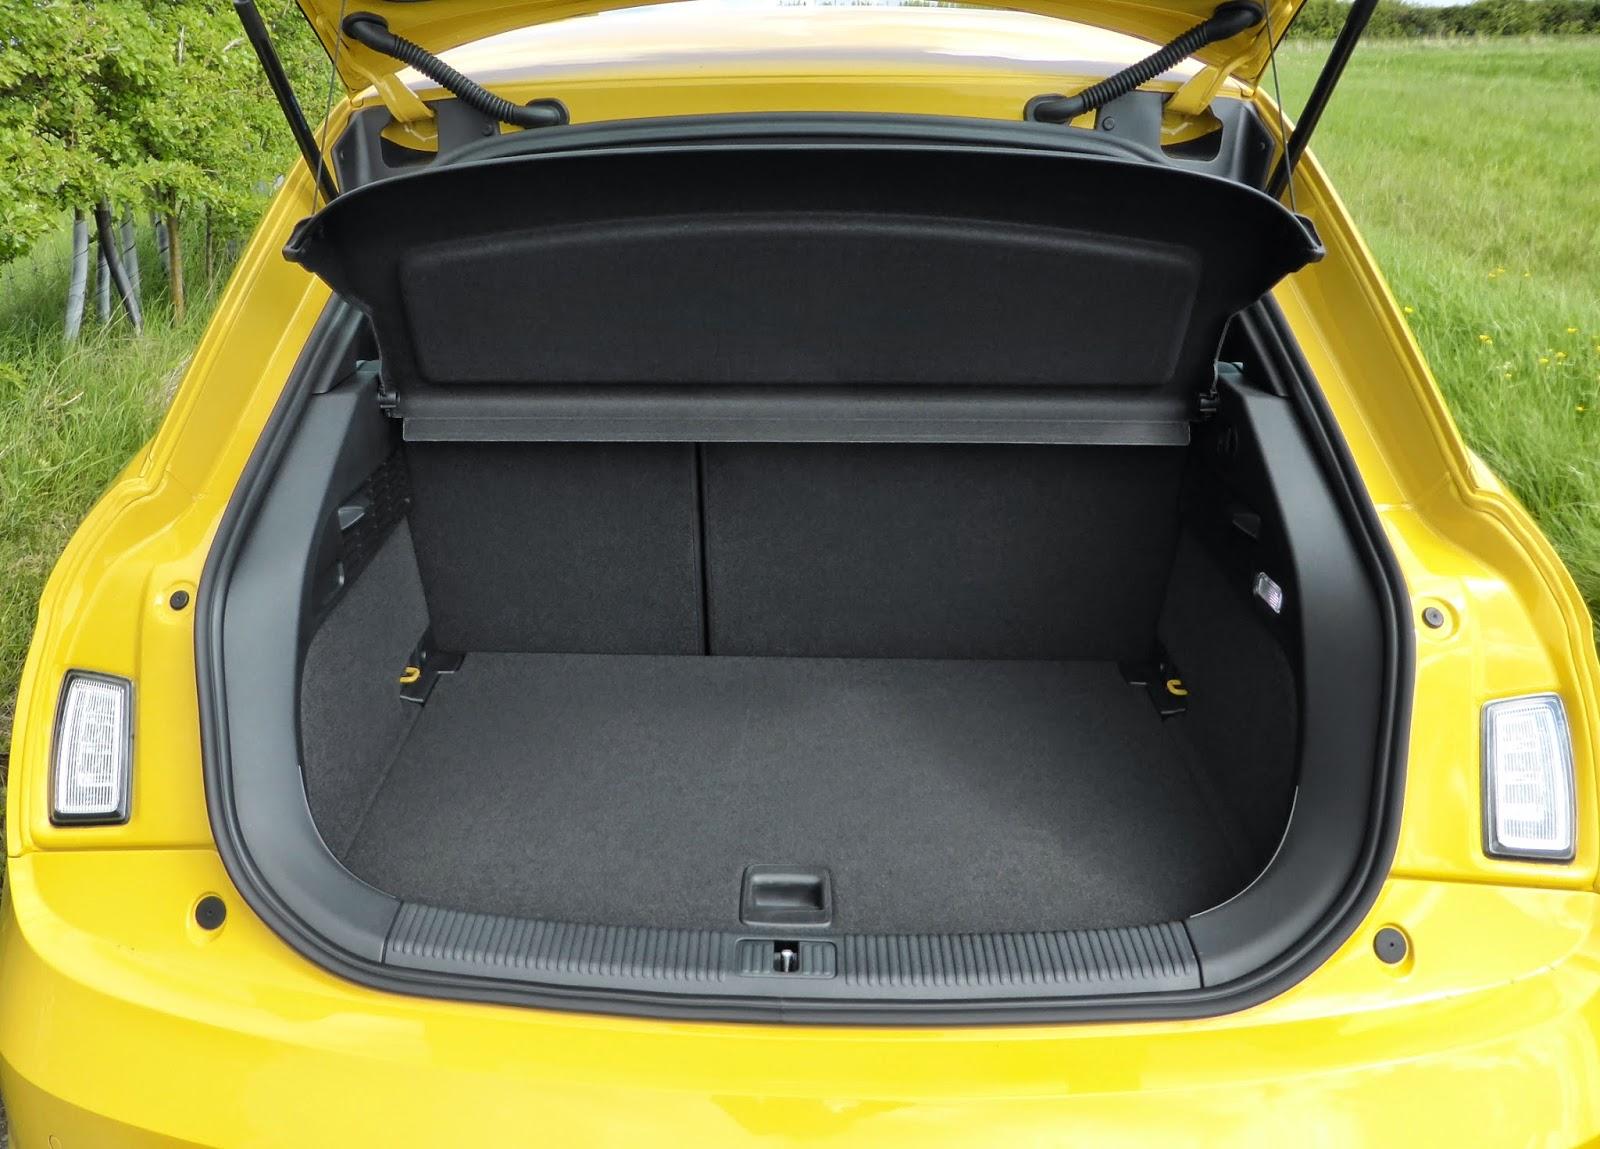 2014 Audi S1 boot